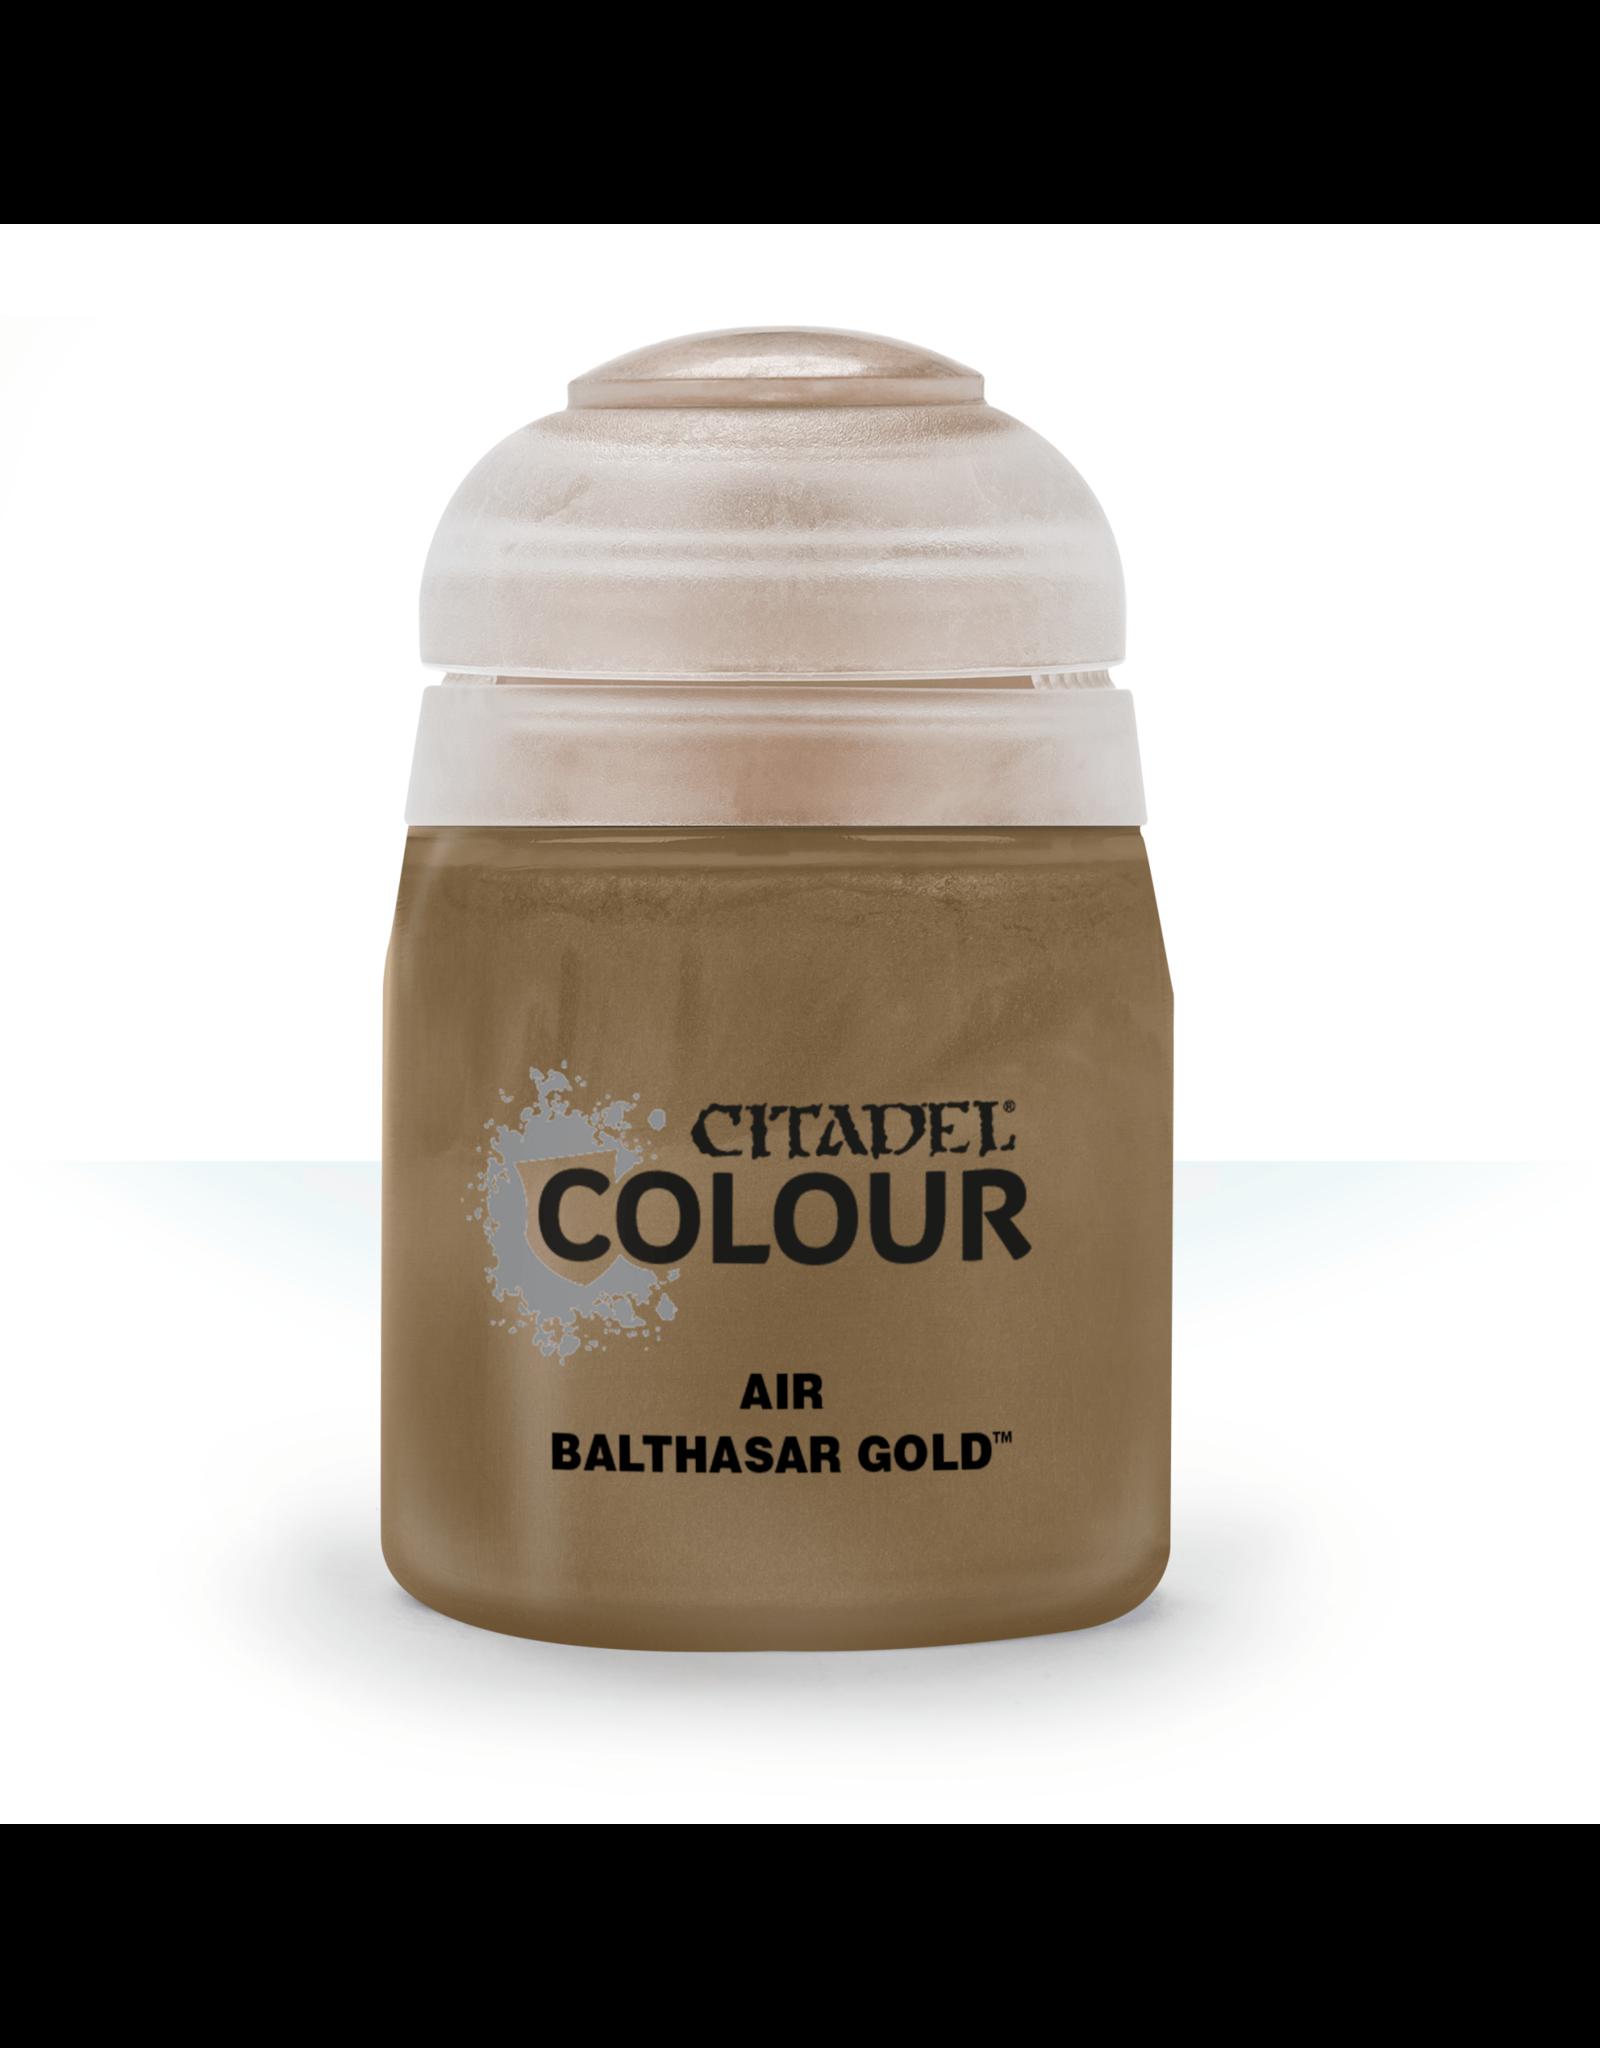 Citadel Citadel Paints Air Paint Balthasar Gold